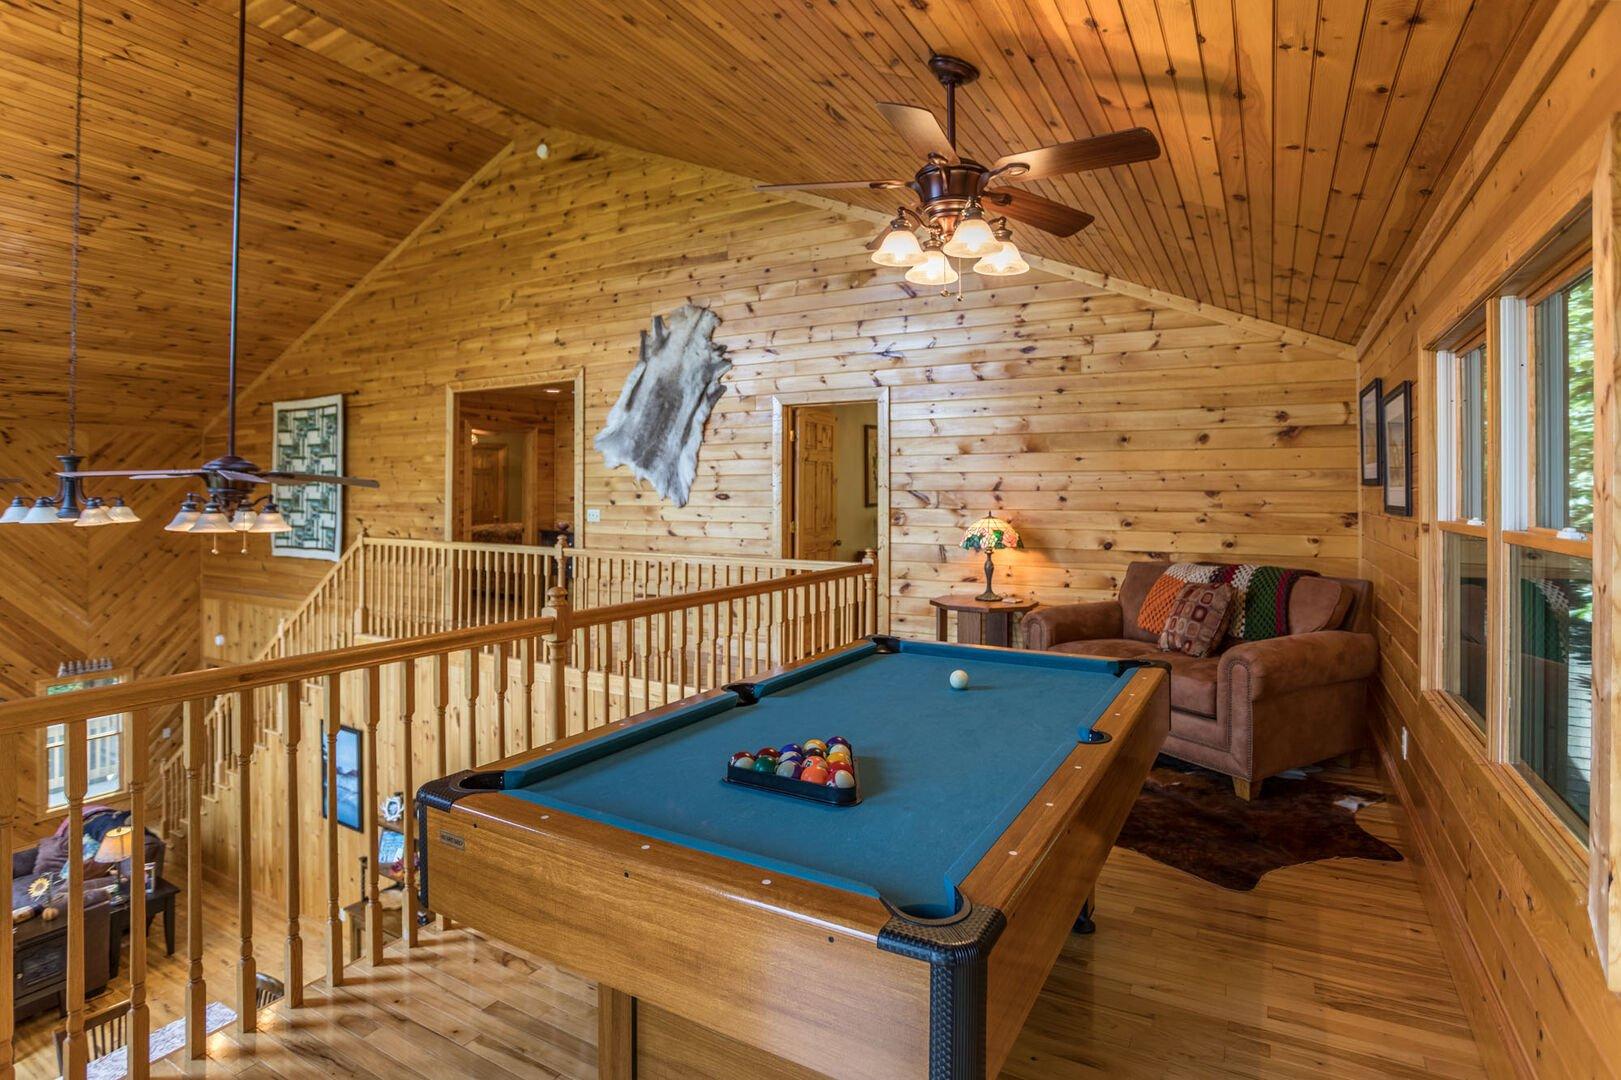 Pool table in upstairs loft